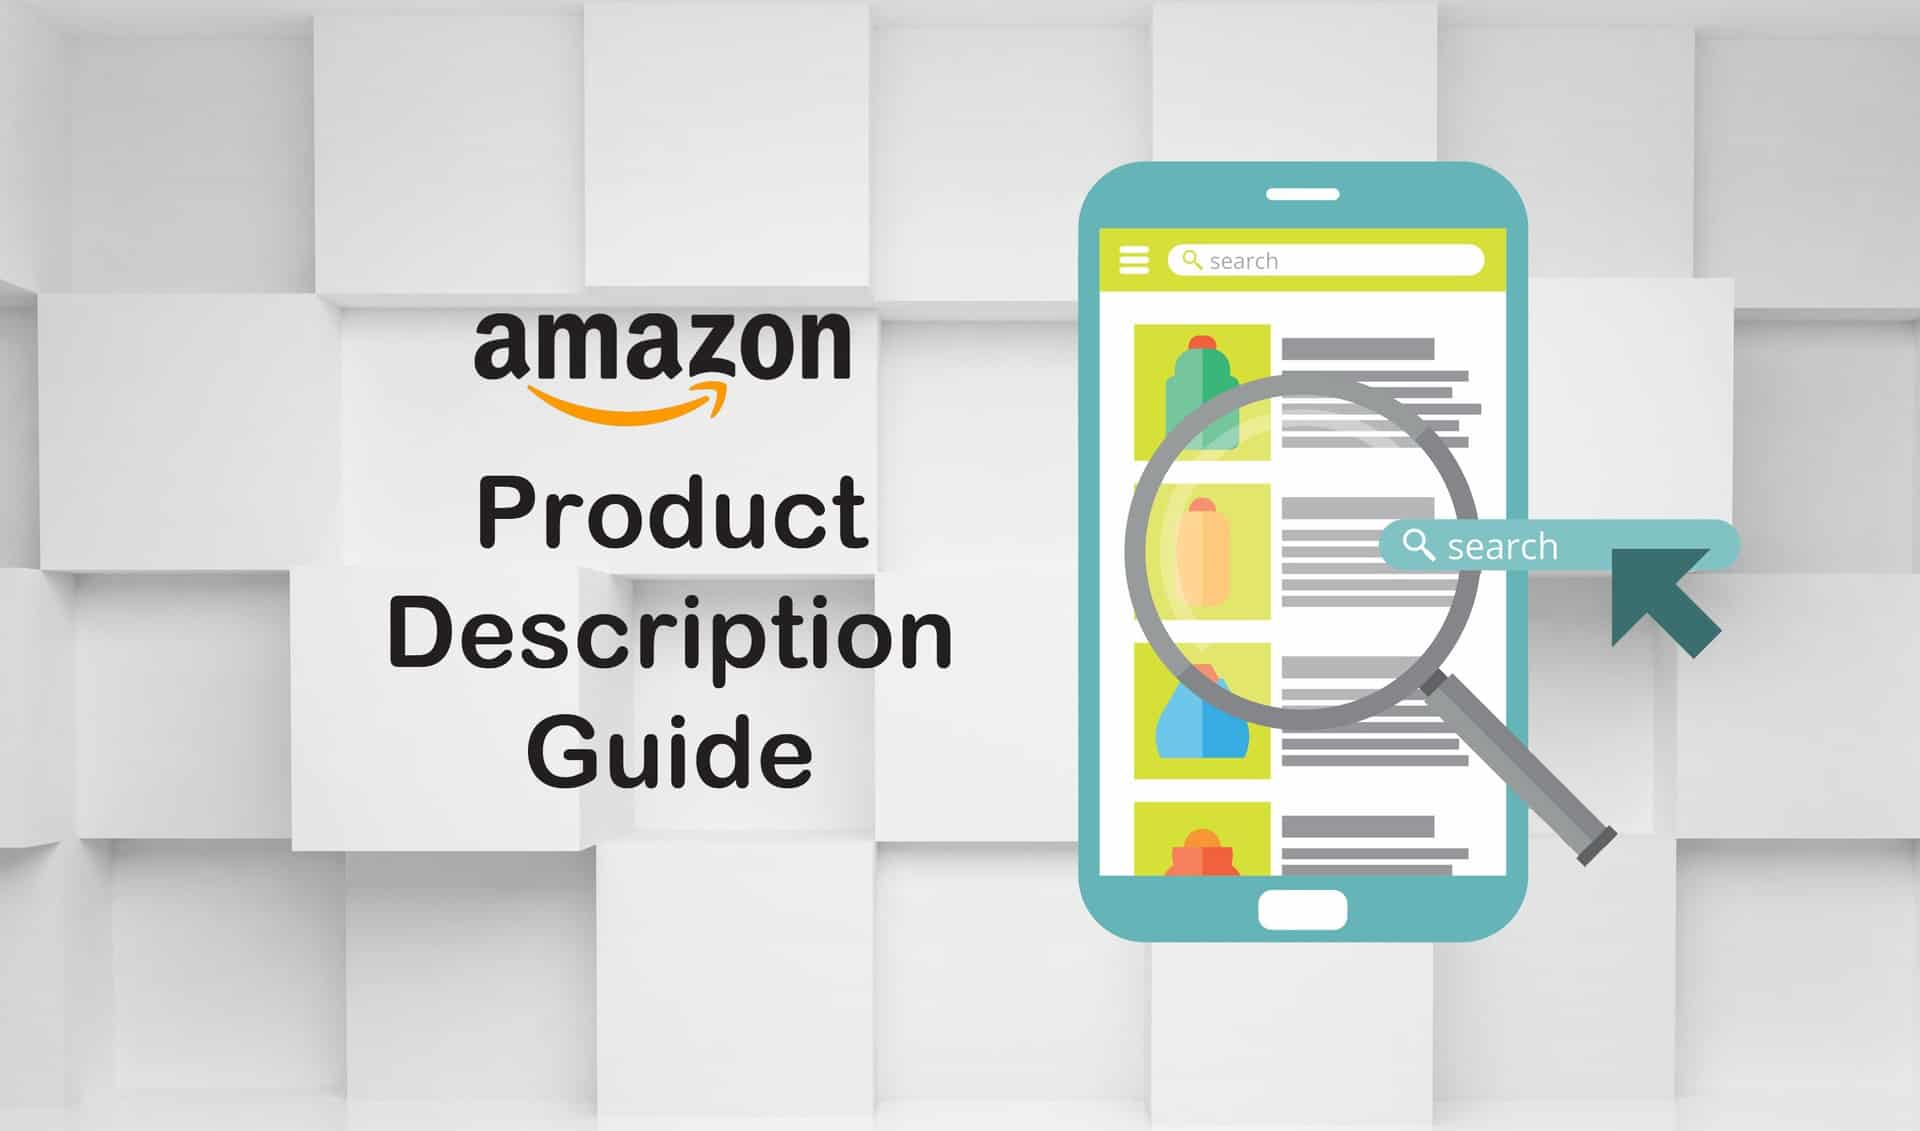 Amazon Product Description Guide